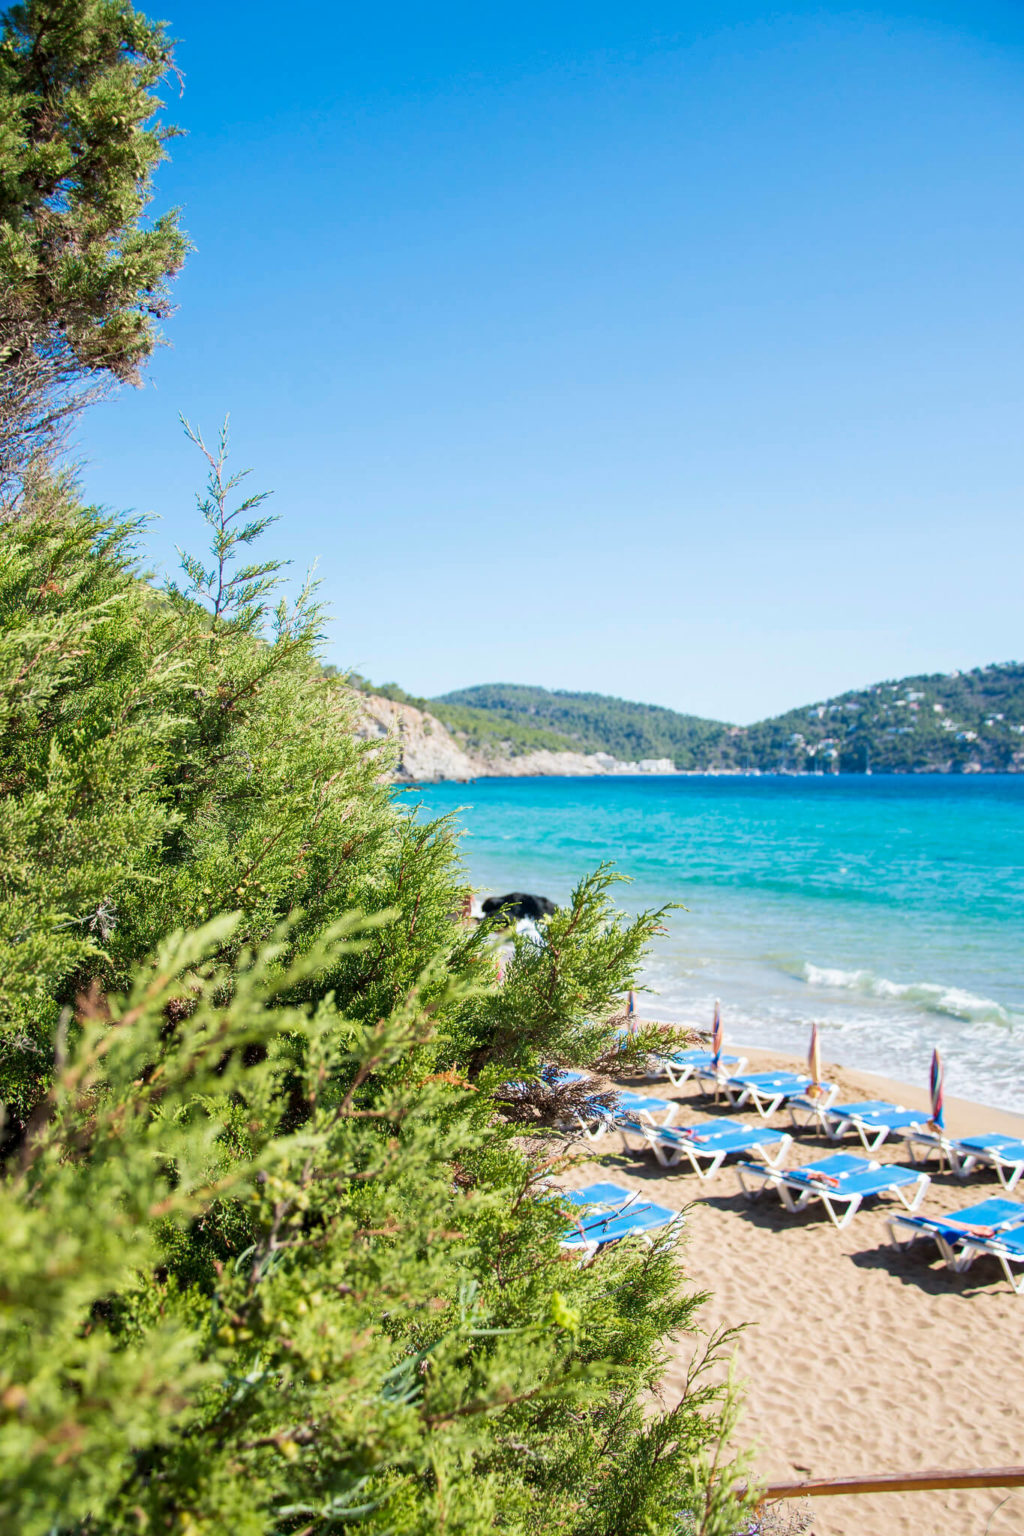 https://www.white-ibiza.com/wp-content/uploads/2020/03/ibiza-beaches-aguas-blancas-06-1024x1536.jpg